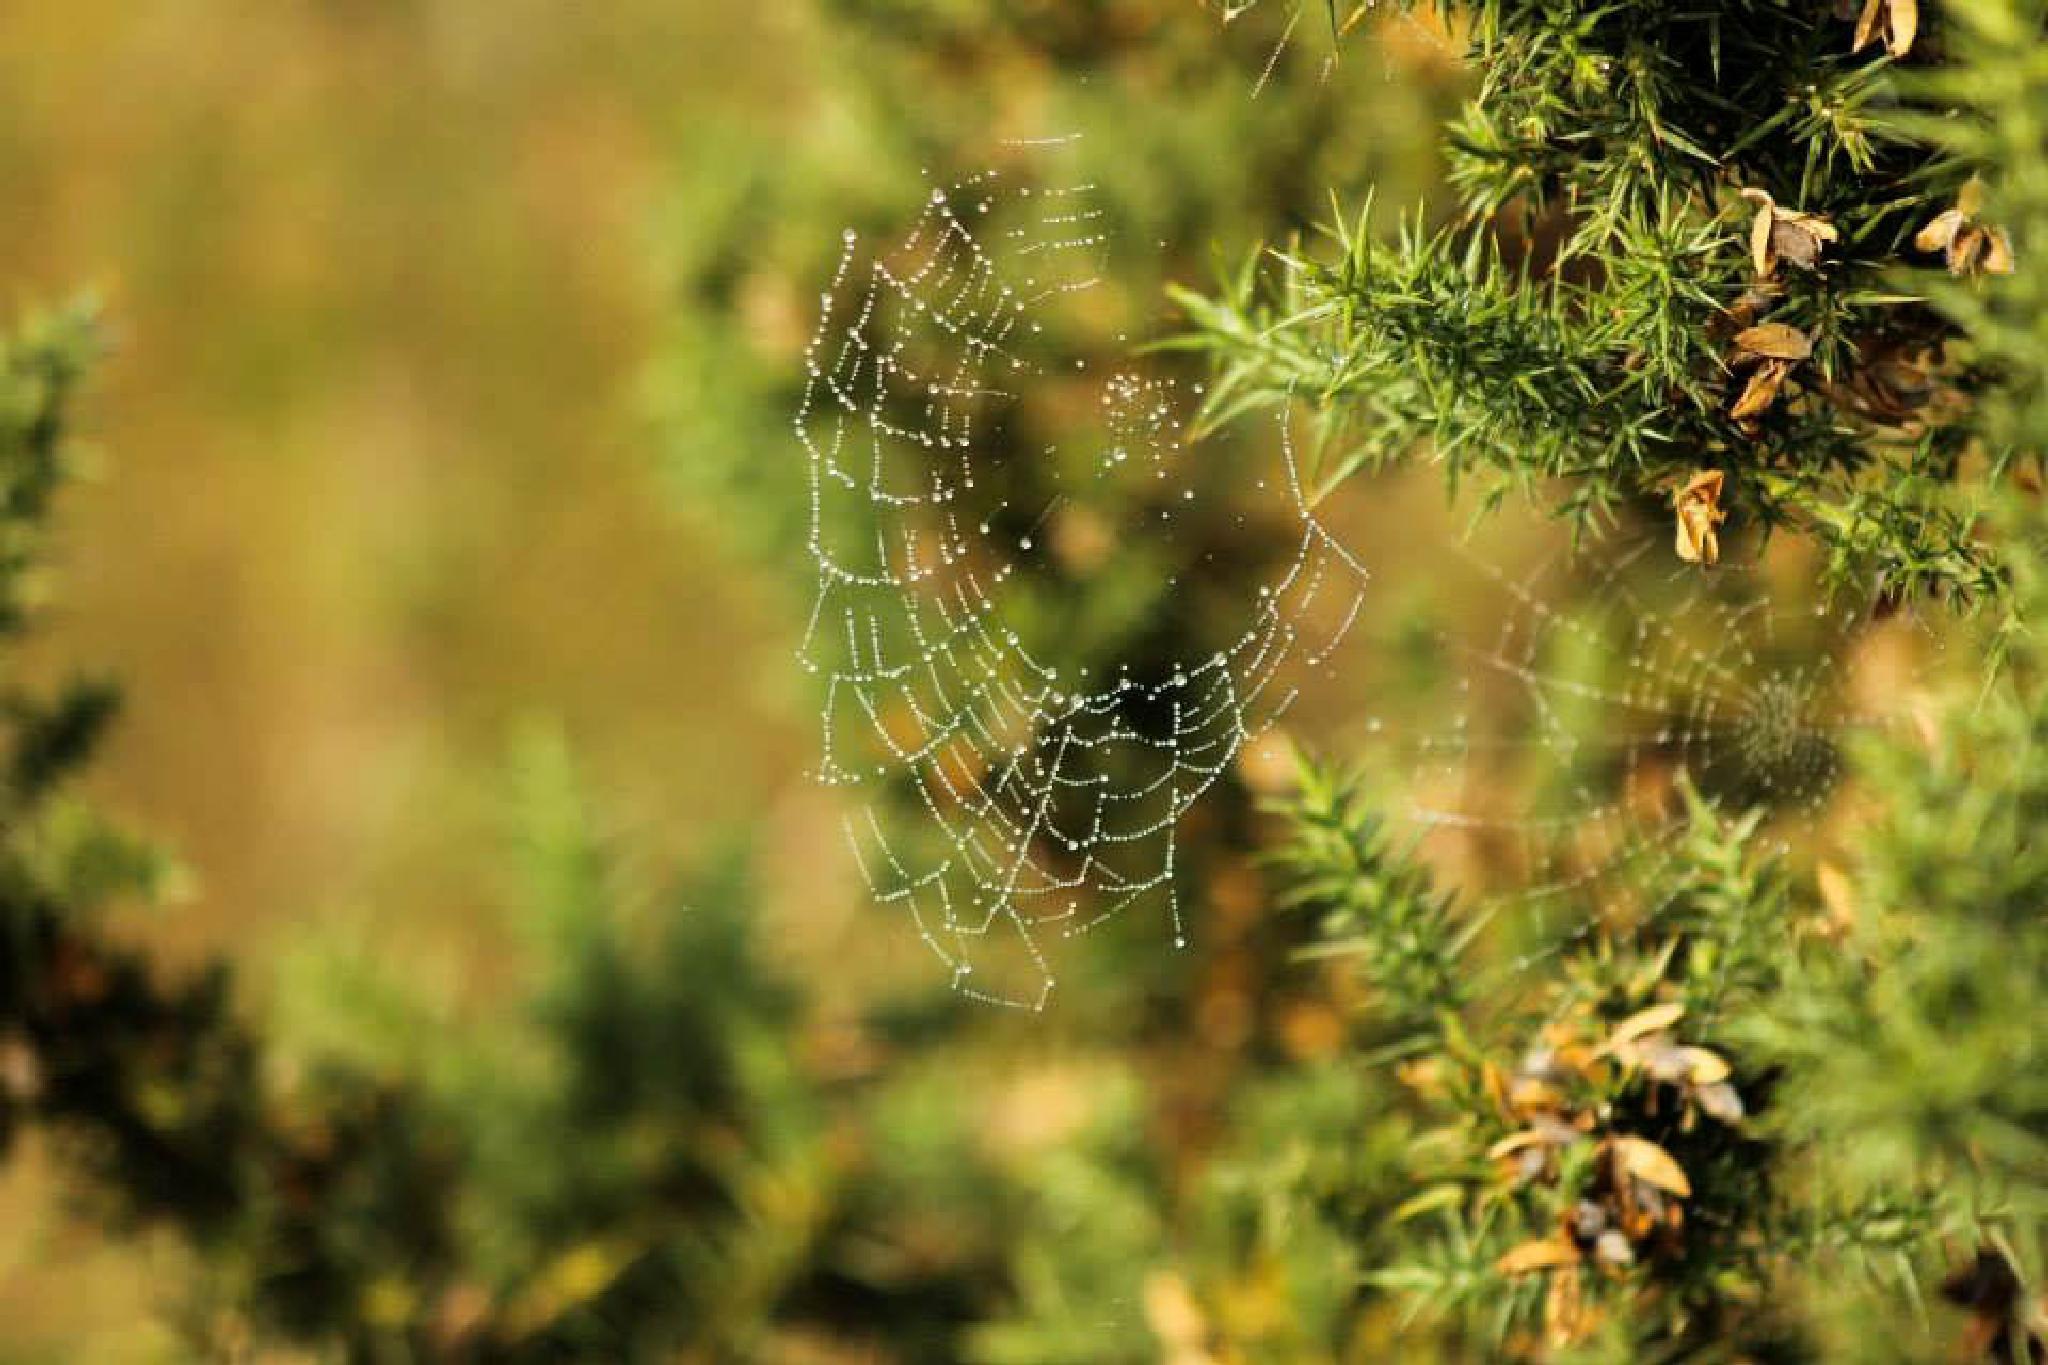 Spiderweb by donata.panczyk